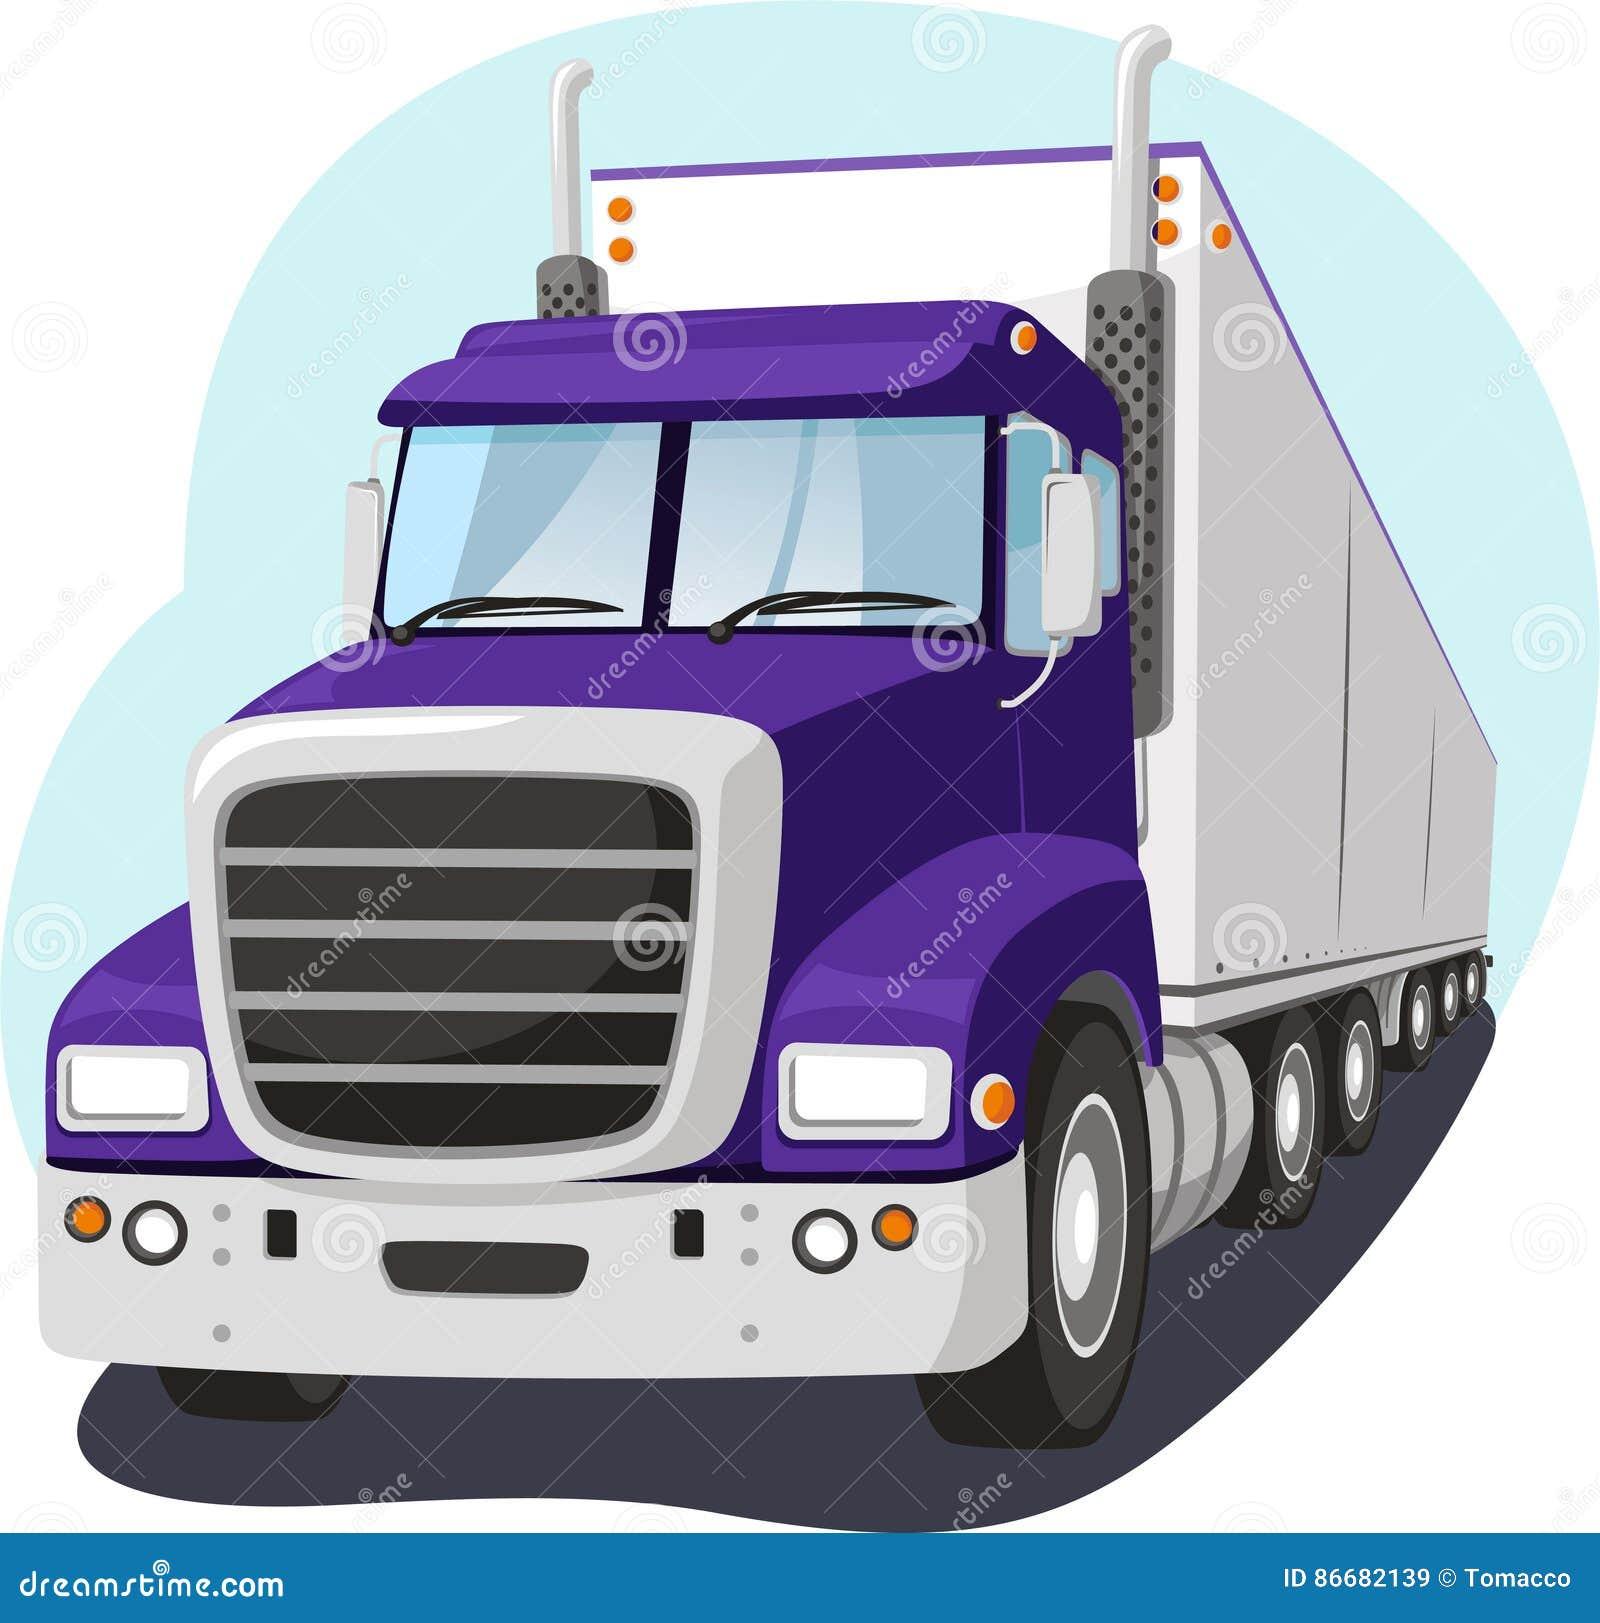 Cargo Truck Cartoon Illustration Stock Illustration ...